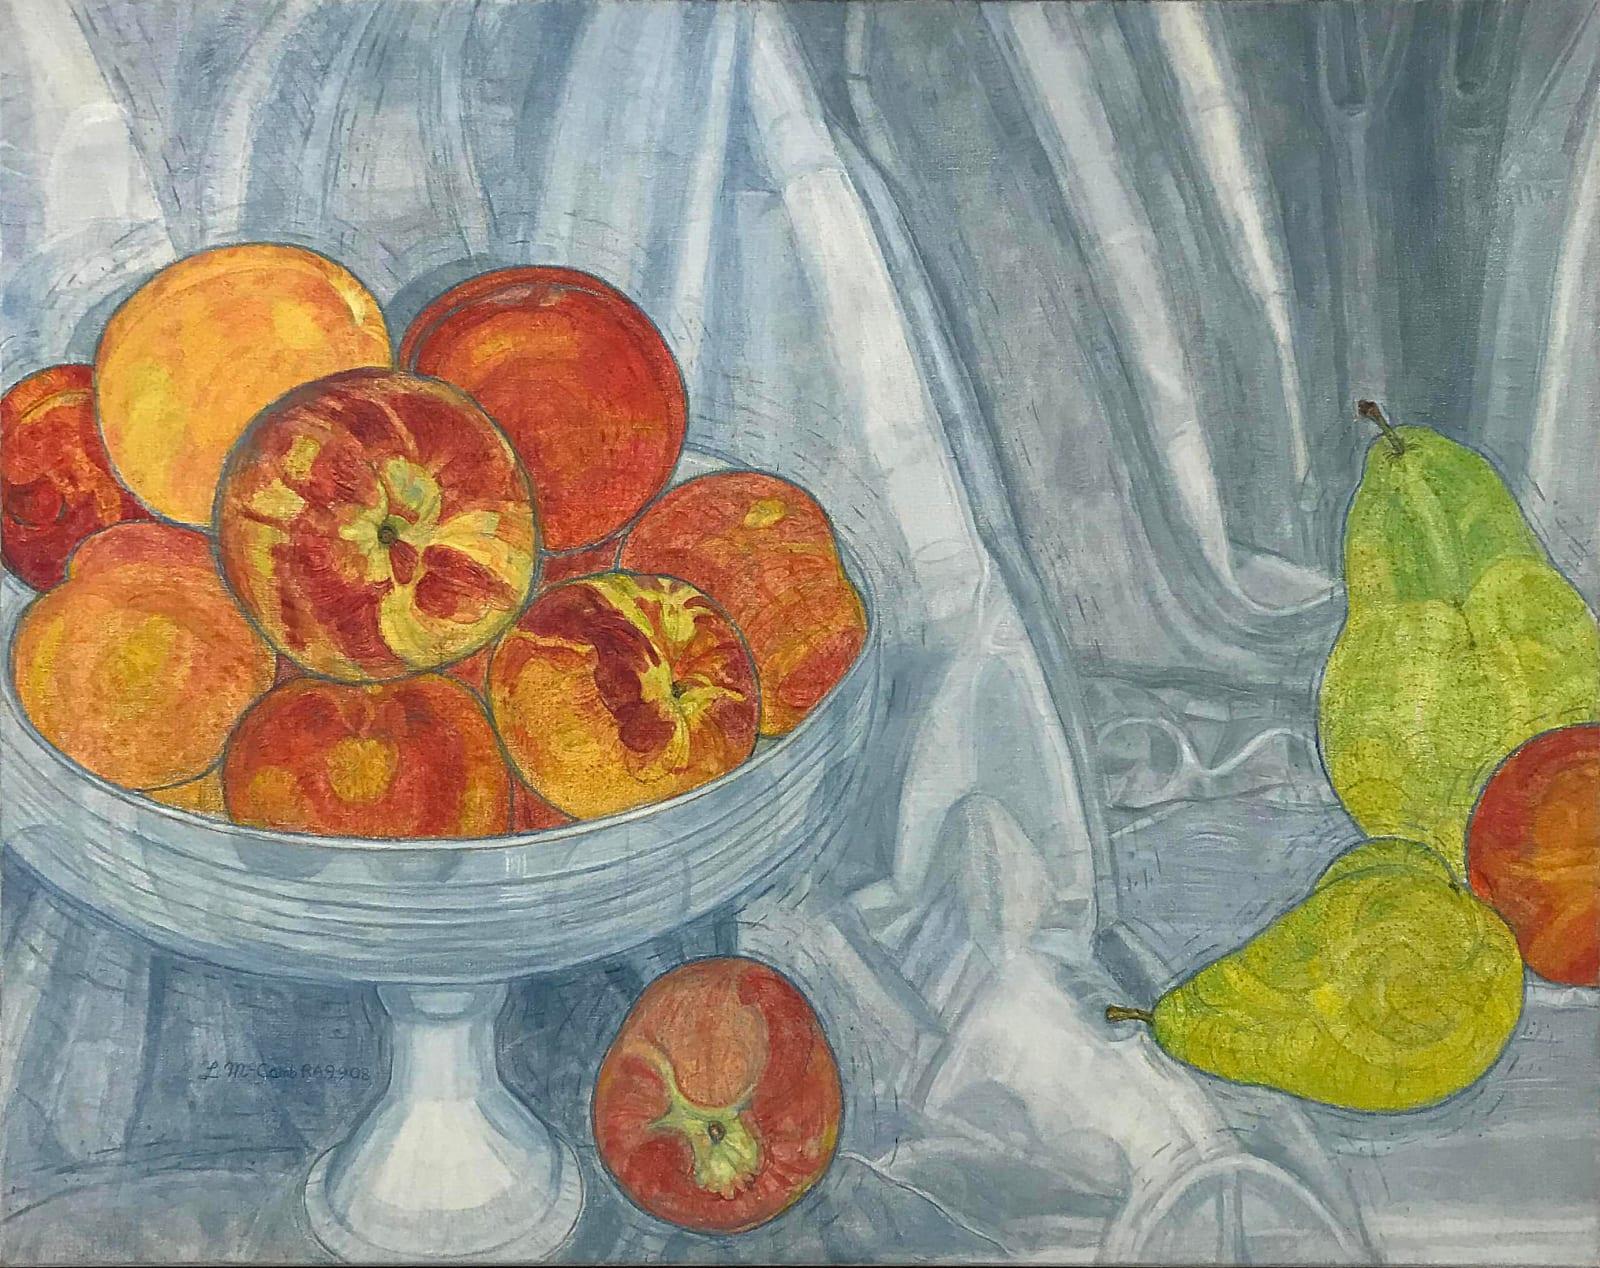 Leonard Mccomb, Peaches and Pears, 2008